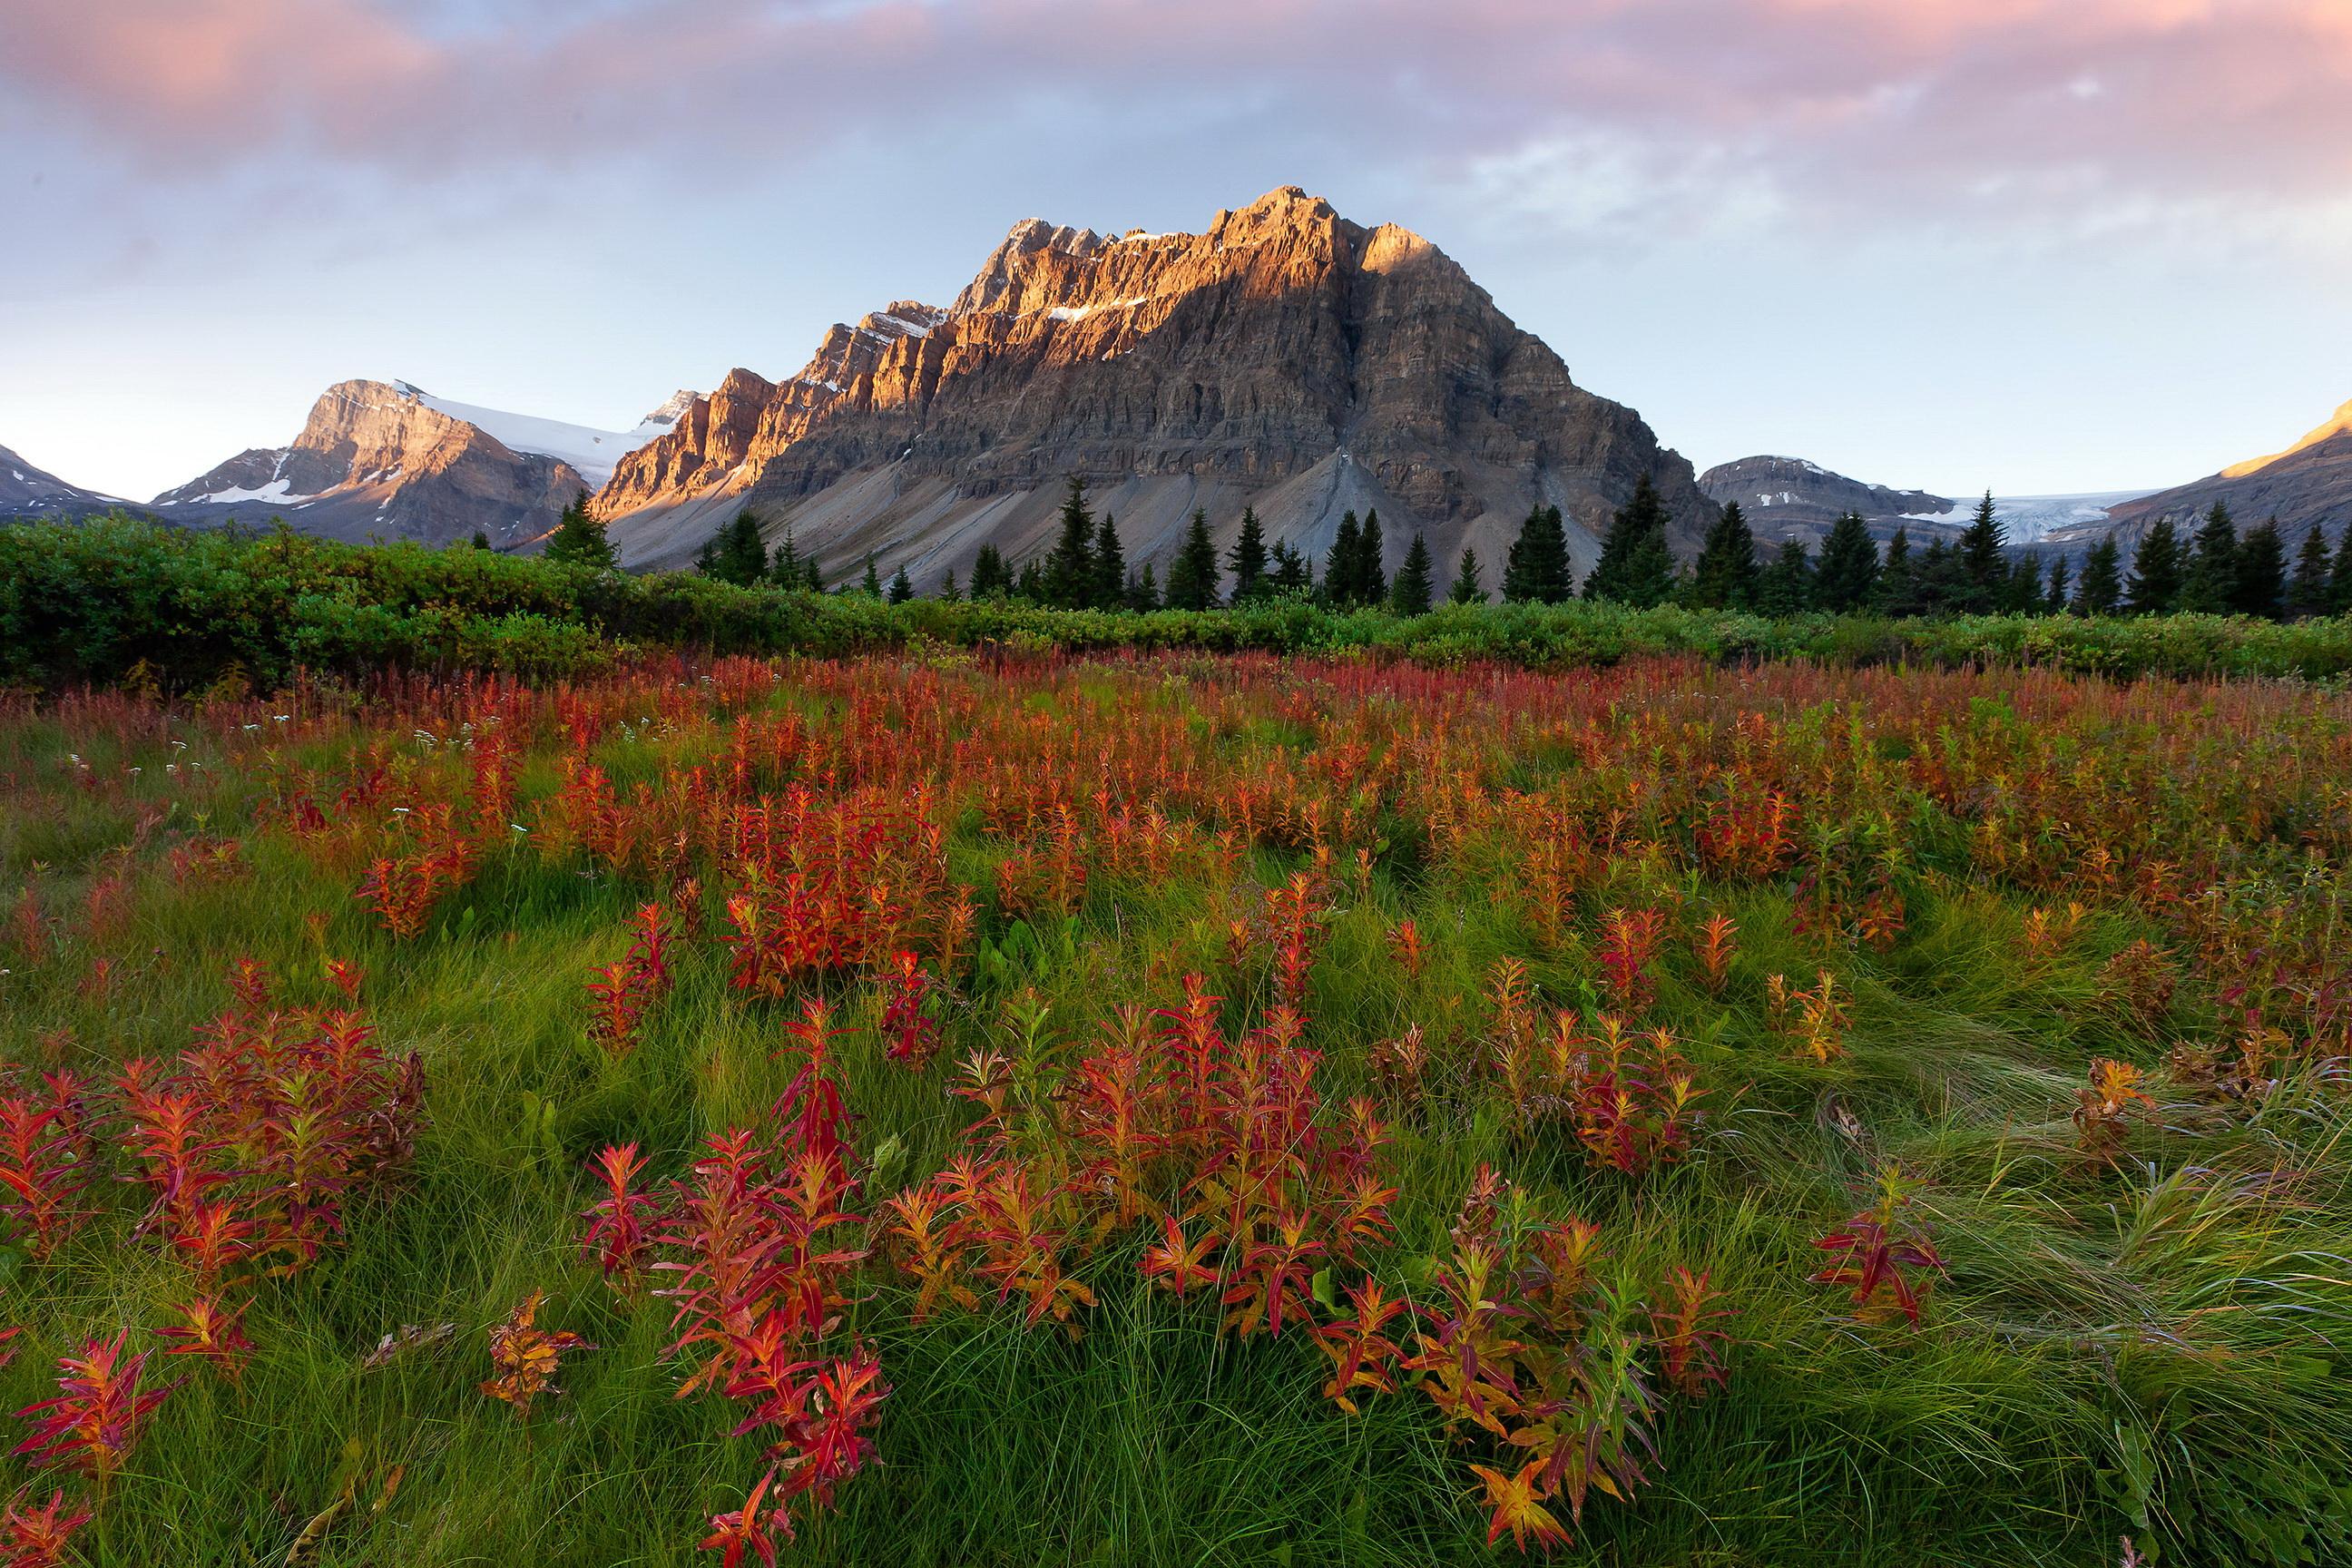 Mountains Scenery Glacier Montana Grass Nature wallpaper 2592x1728 2592x1728